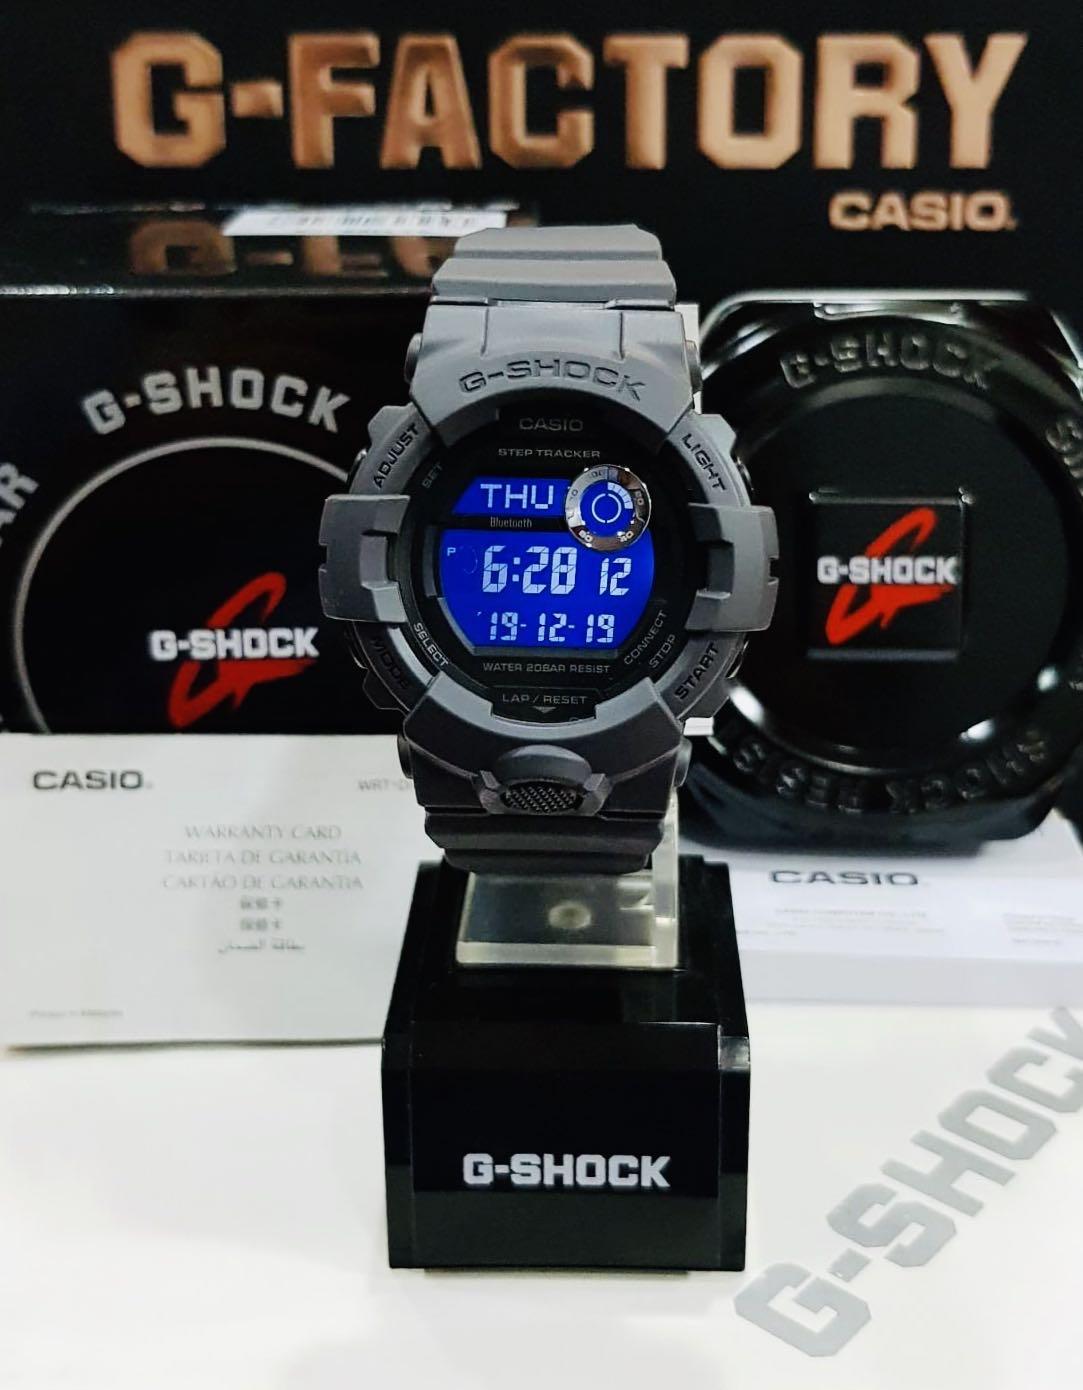 NEW🌟BLUETOOTH COUPLE💝SET : GKING GSHOCK UNISEX DIVER SPORTS WATCH : 100% ORIGINAL AUTHENTIC CASIO BABY-G-SHOCK : GX-56BB-1 + GBD-800UC-8 / GX-56-1 + GBD-800-8